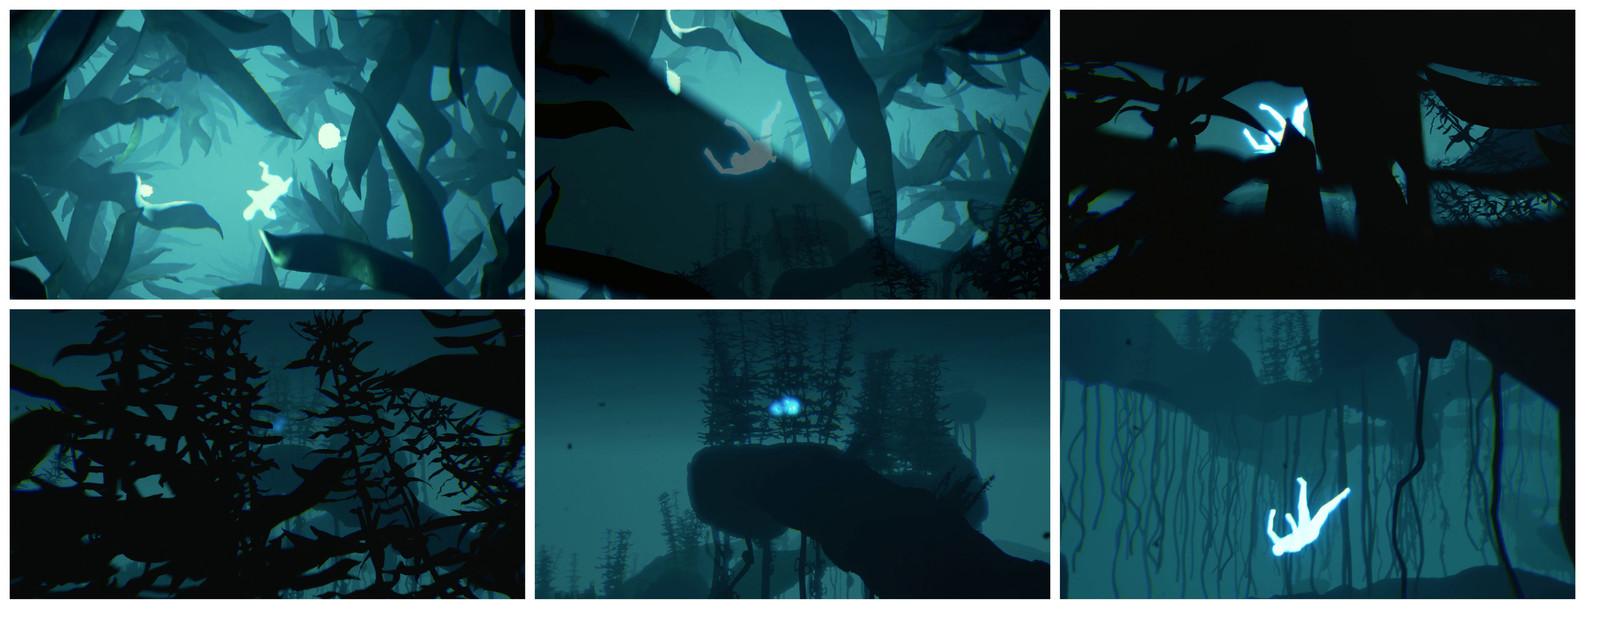 Video screencaps.